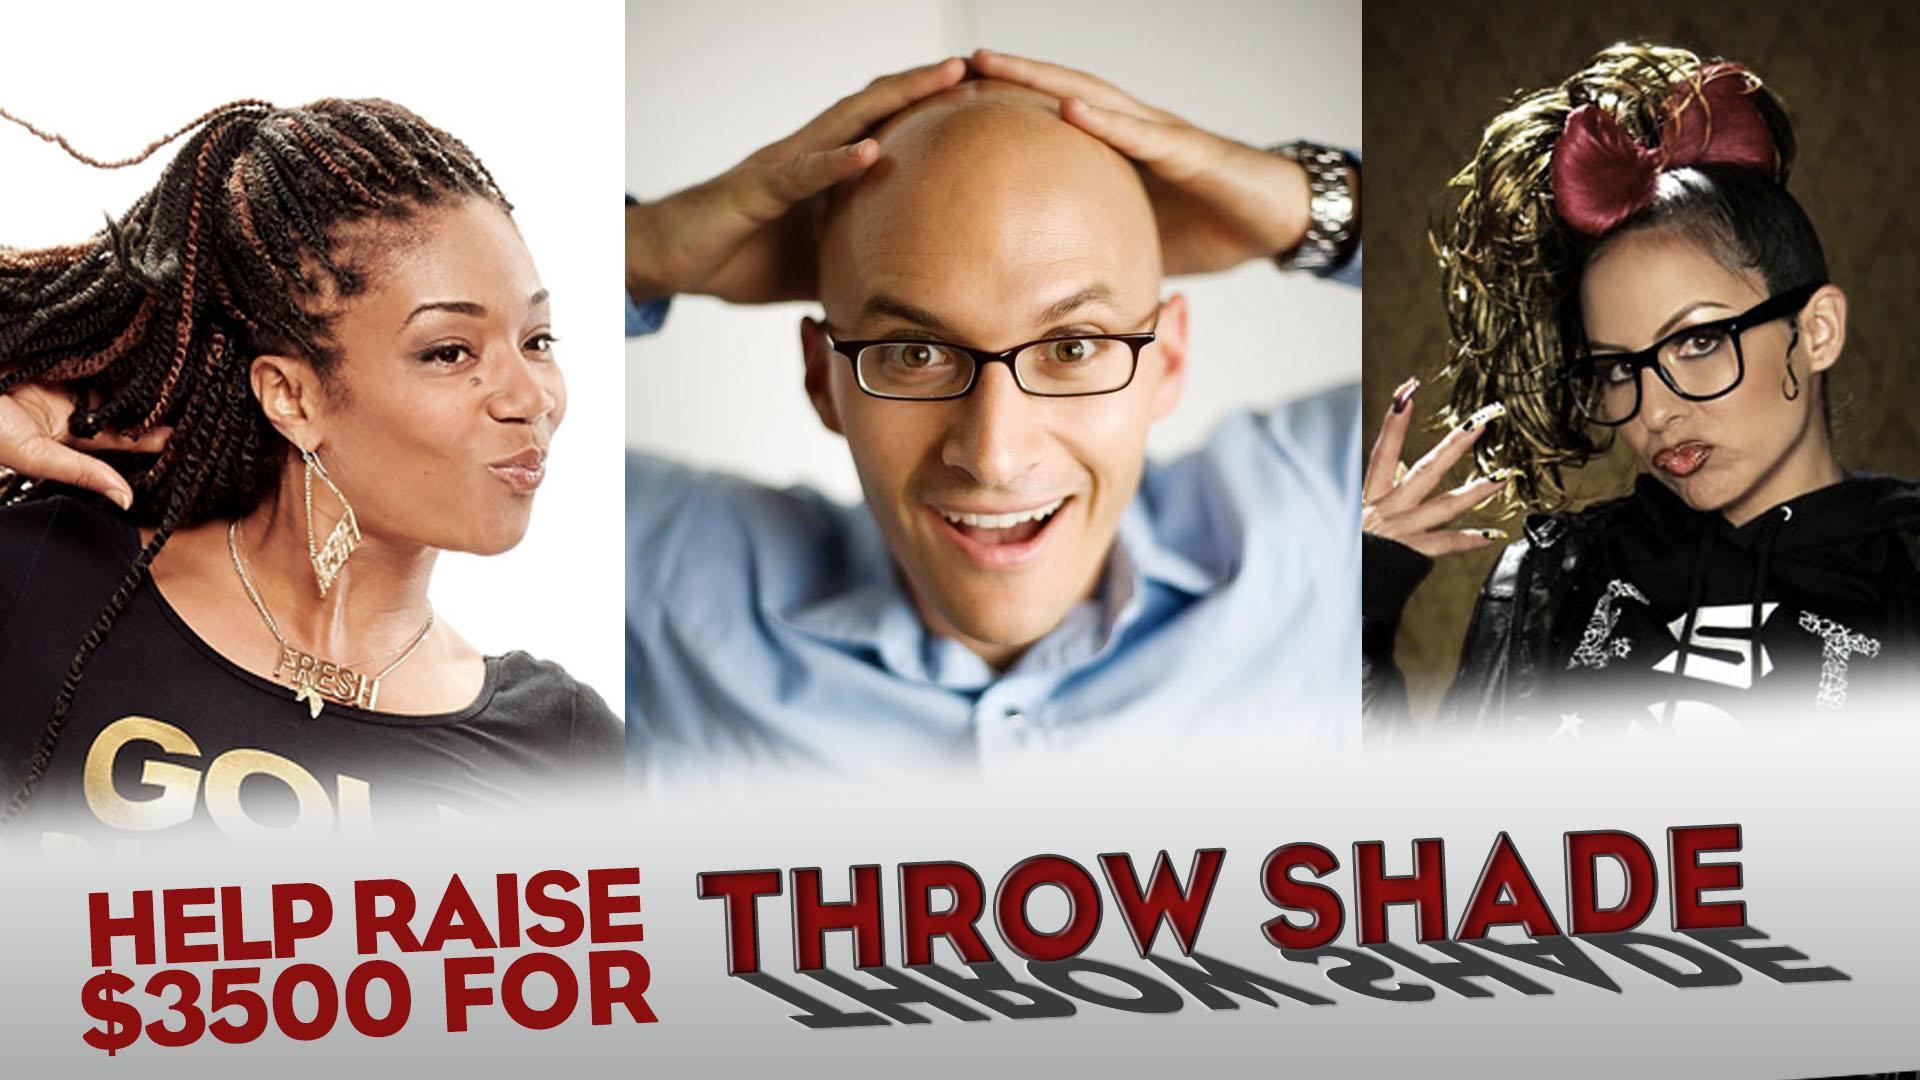 throw-shade-crowdfunding-thumb